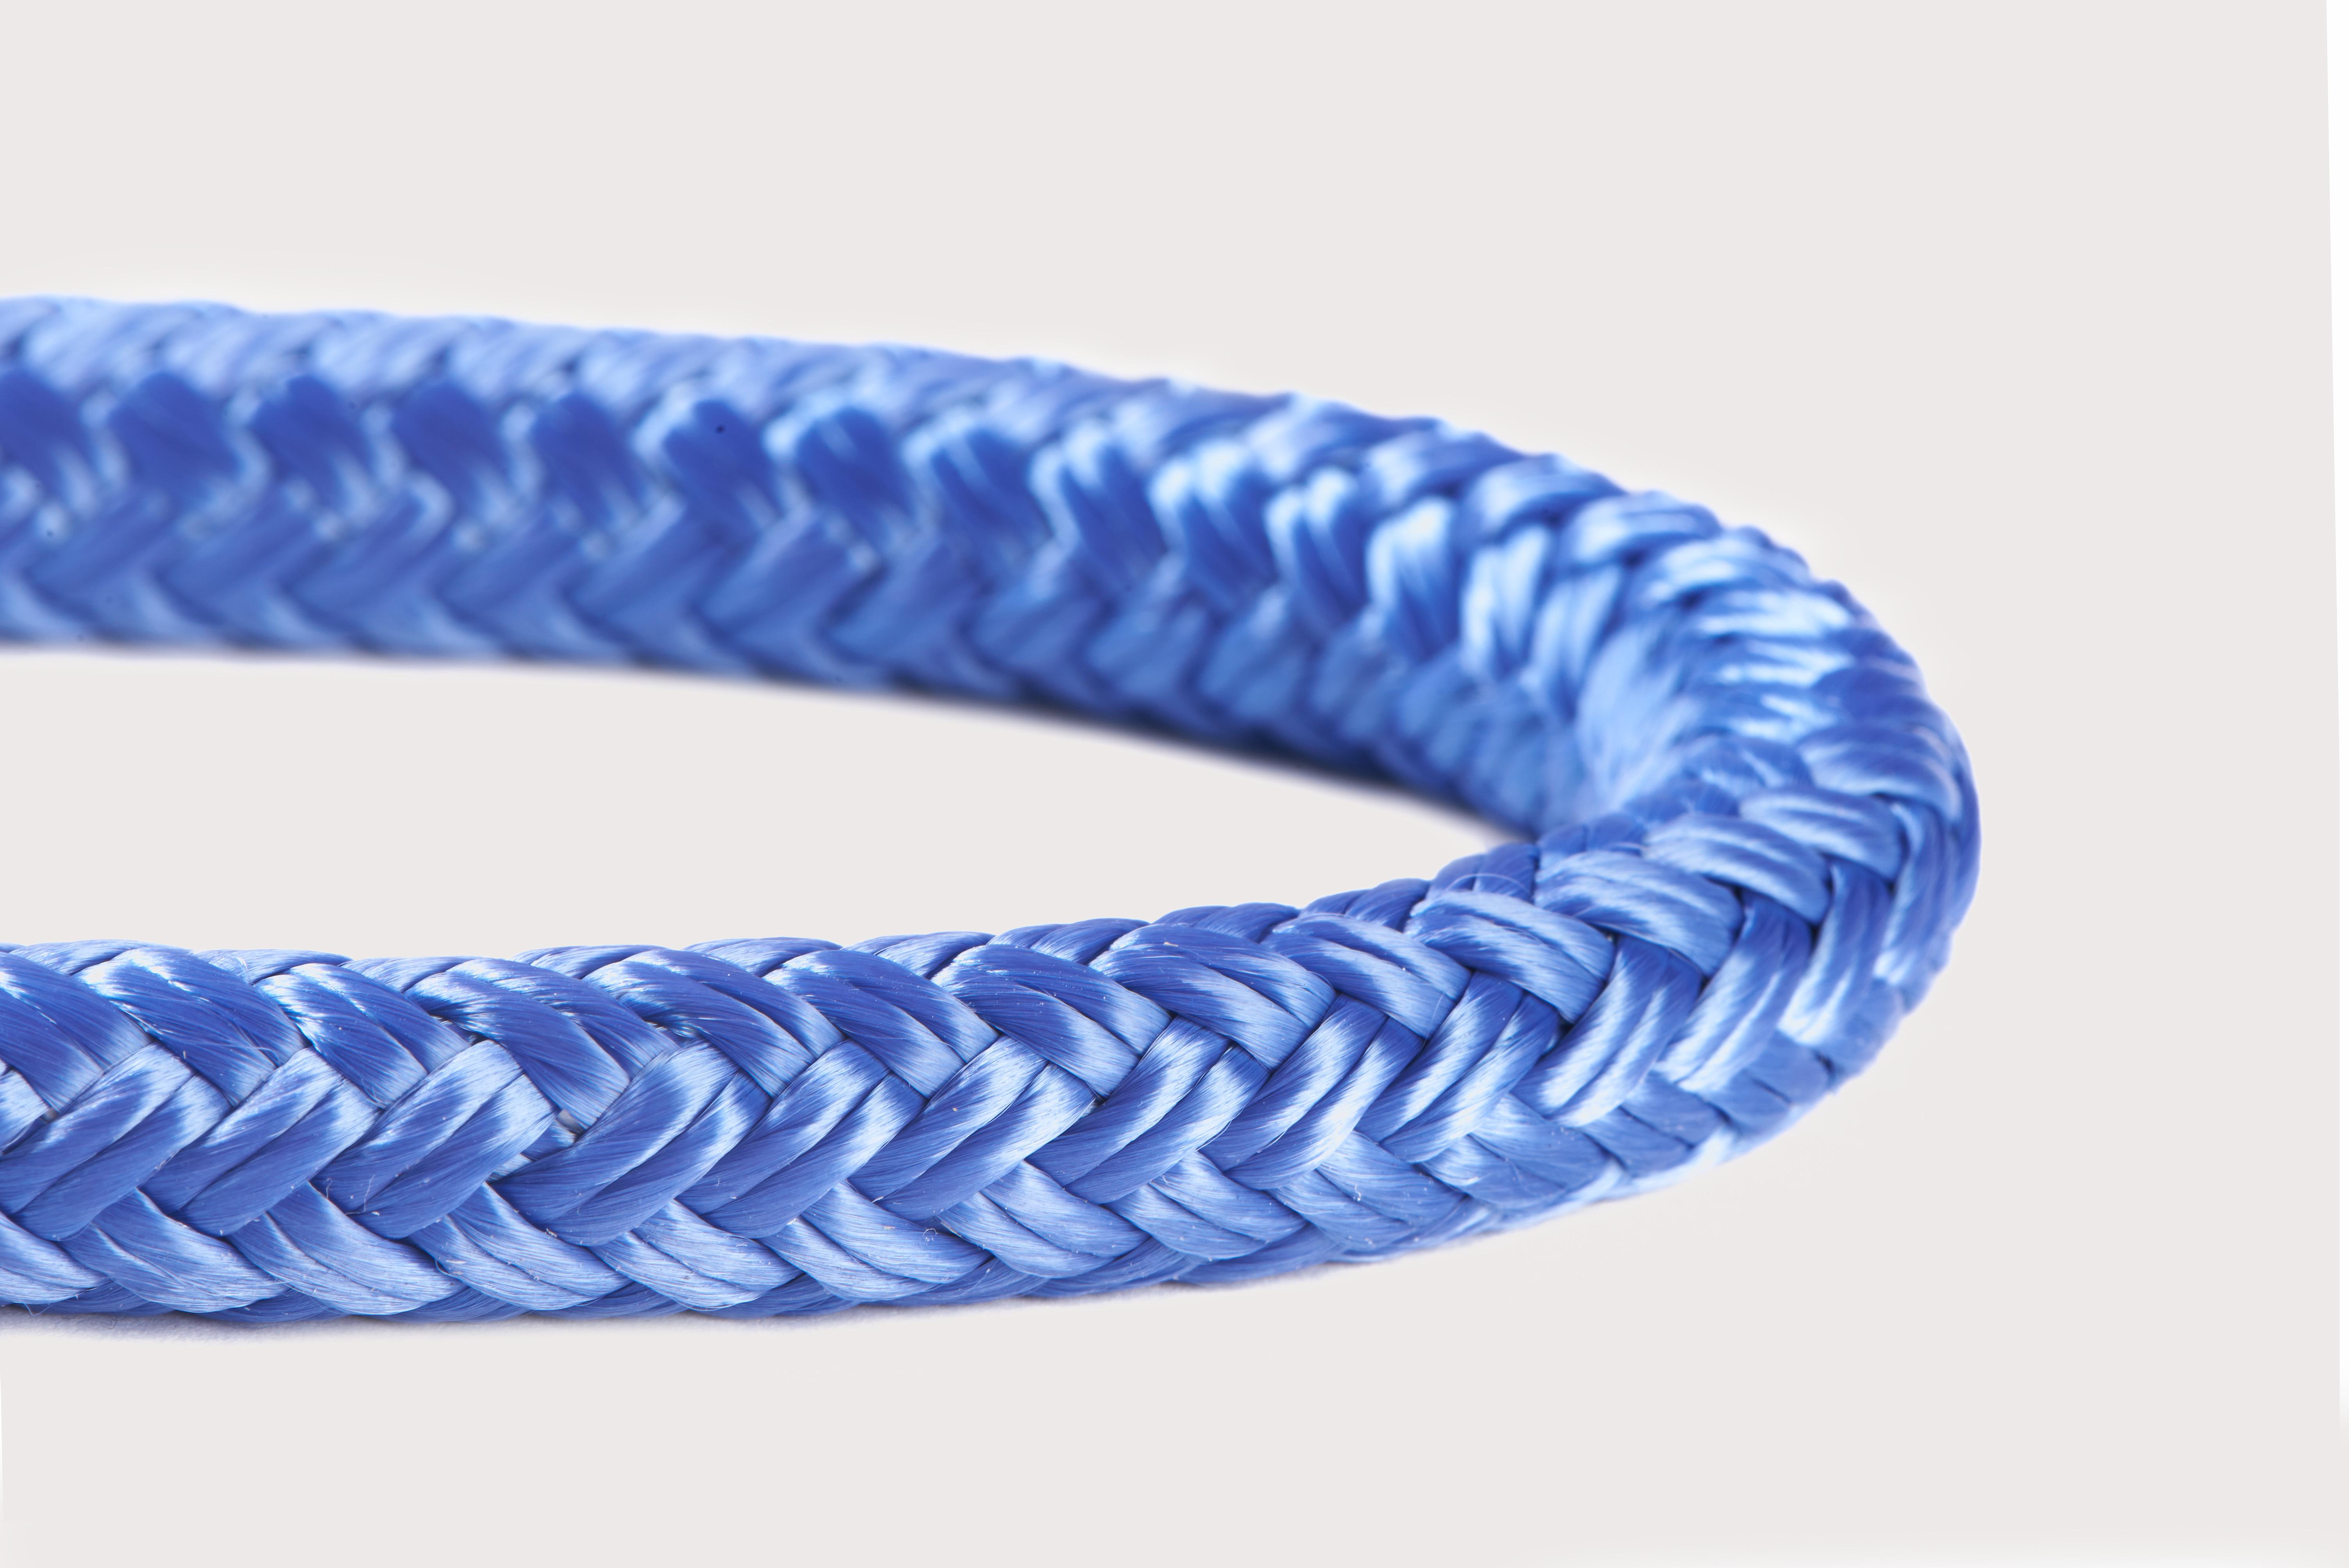 Orion-Cordage-Double Braid Nylon-Blue-Curved167.jpg